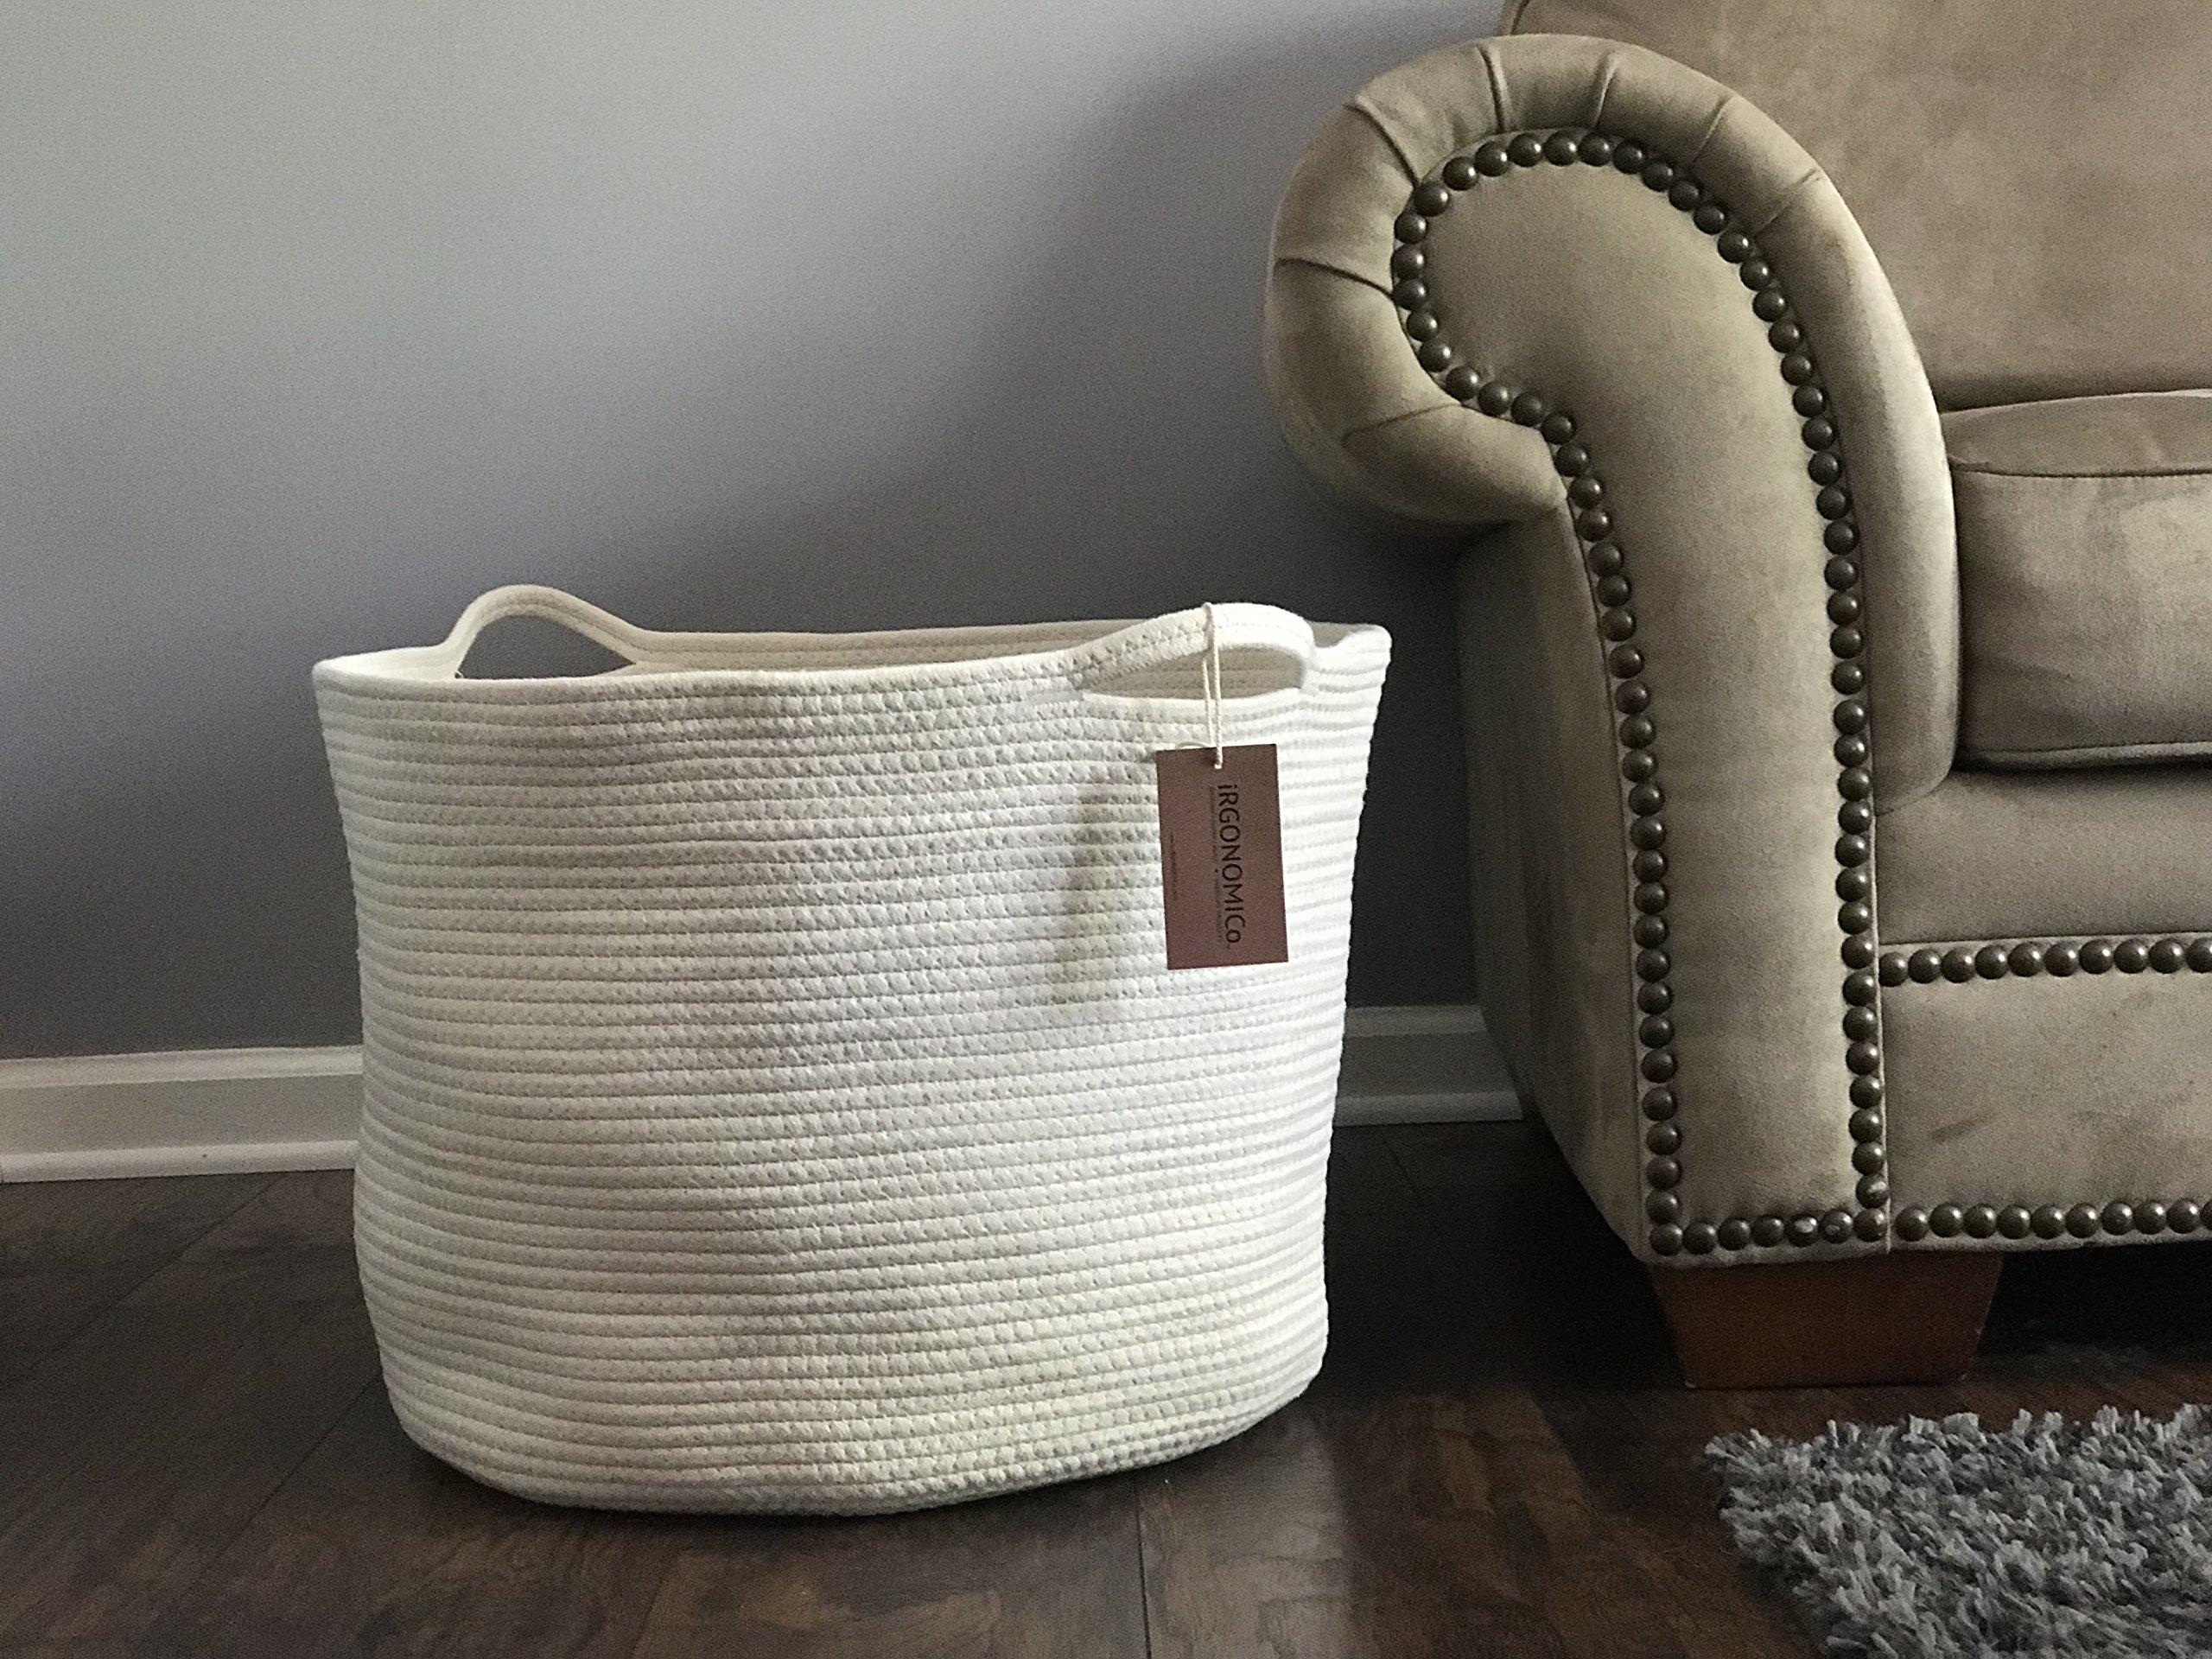 57cf7eb8b327 Details about iRGONOMICo Cotton Rope Storage Baskets XXXL: Extra Large  Cotton Rope Basket